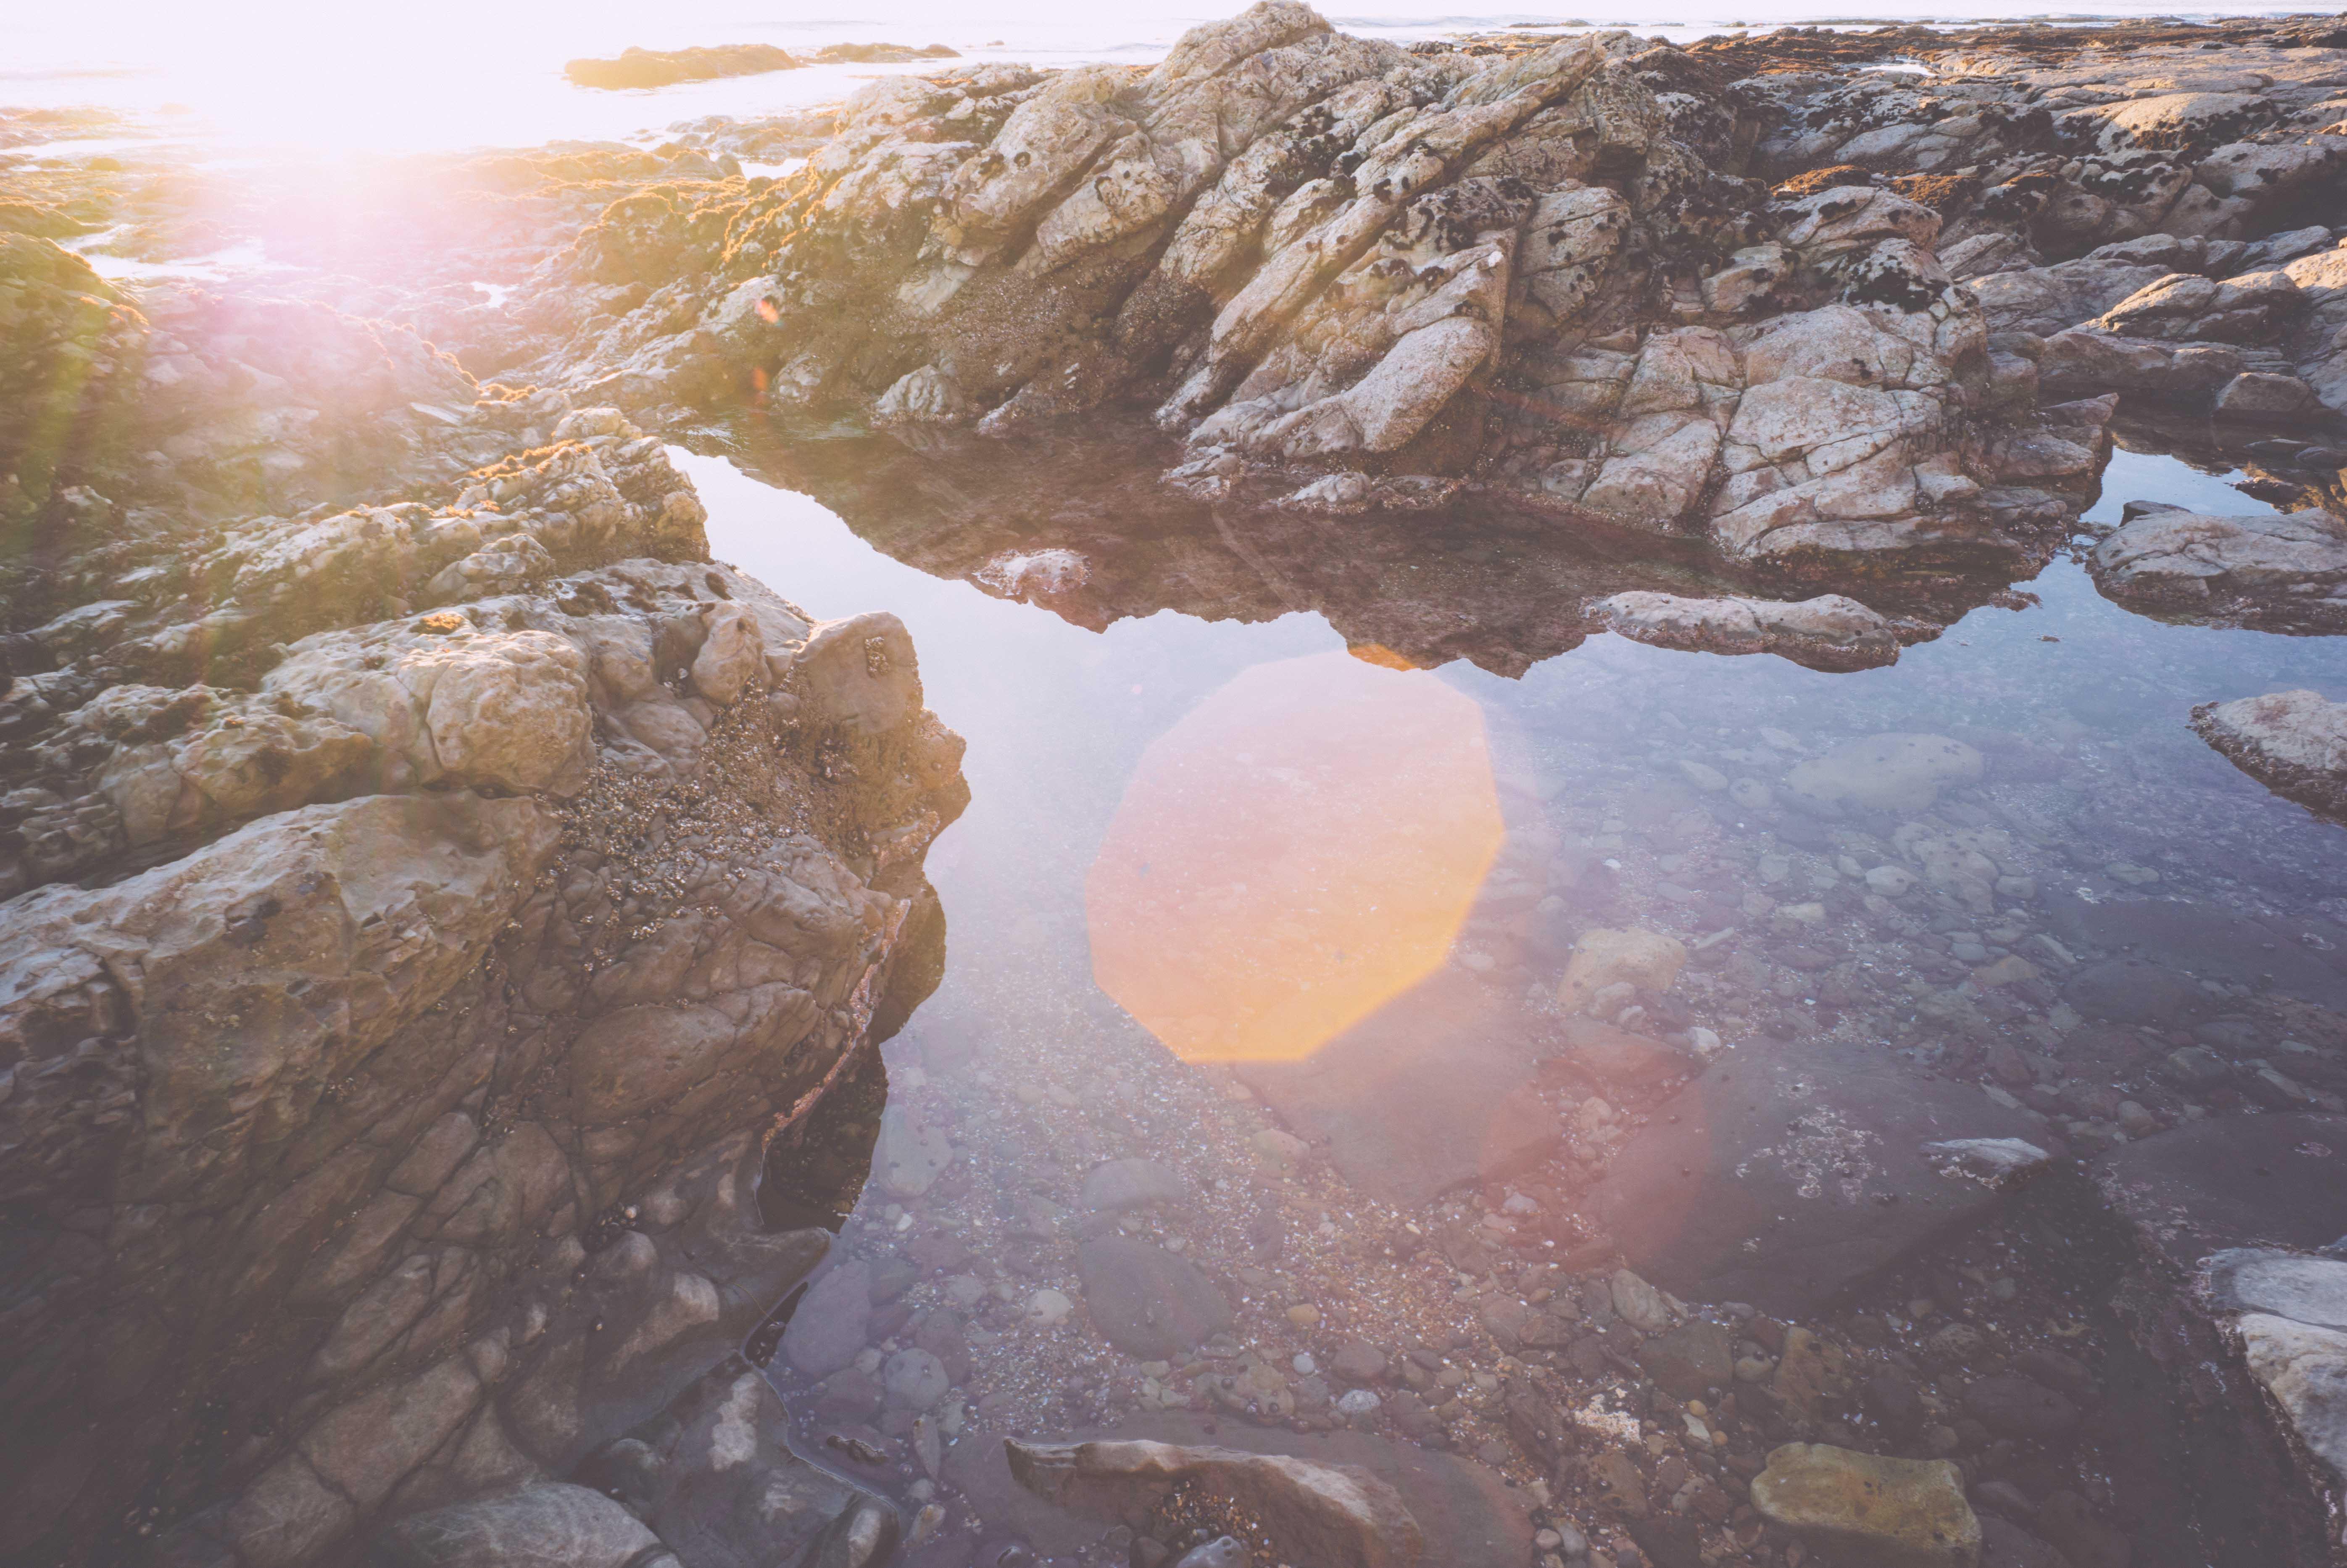 shell_beach-1